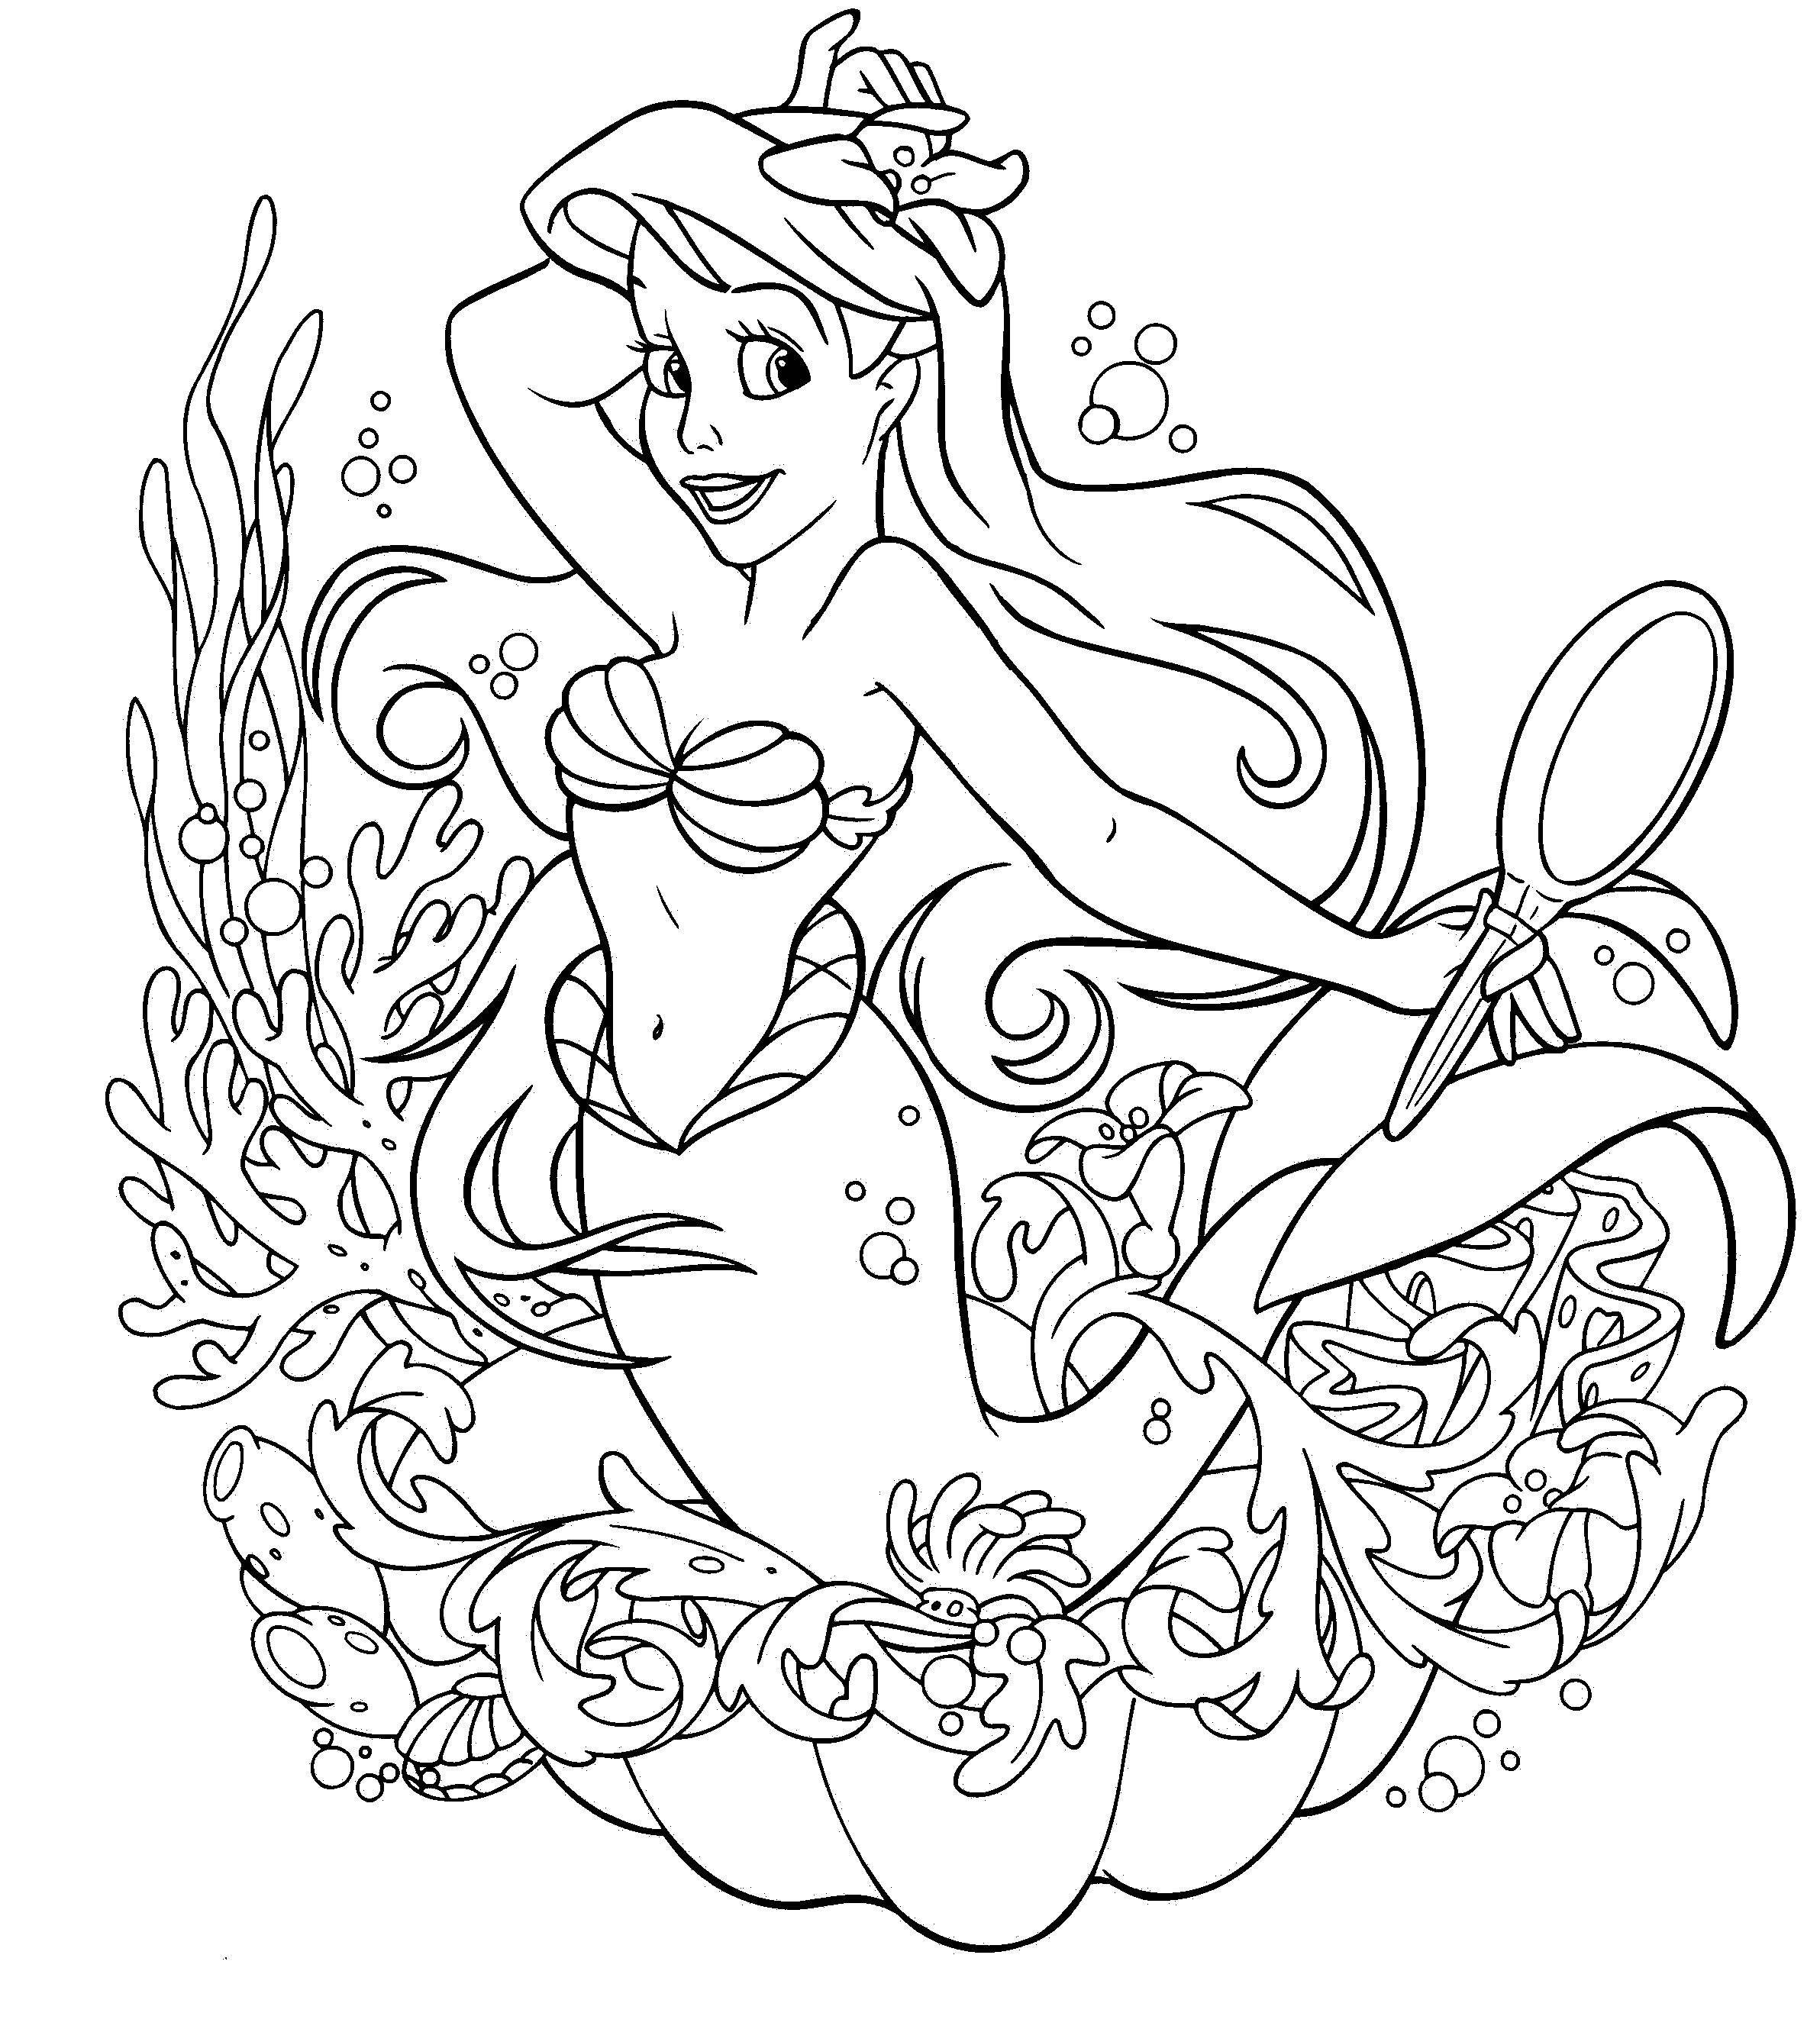 Little Mermaid Coloring Page | kids malen | Pinterest | Ausmalbilder ...